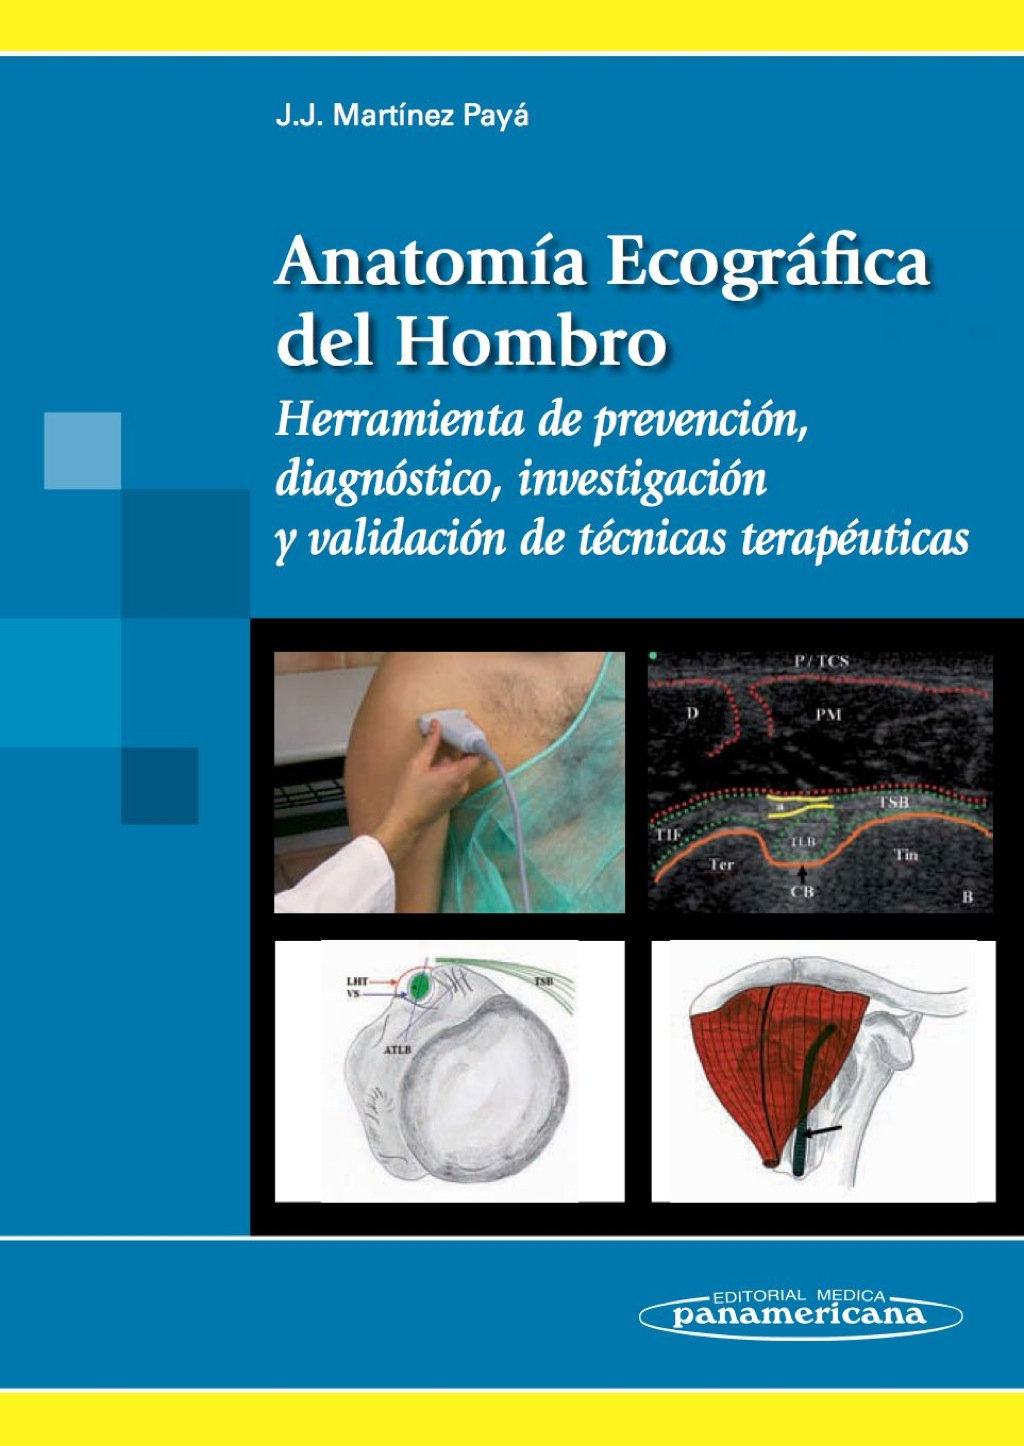 By Jacinto Javier Martínez Payá PRINTISBN: 9788498350548 E-TEXT ISBN: 9788498355017 Edition: 0